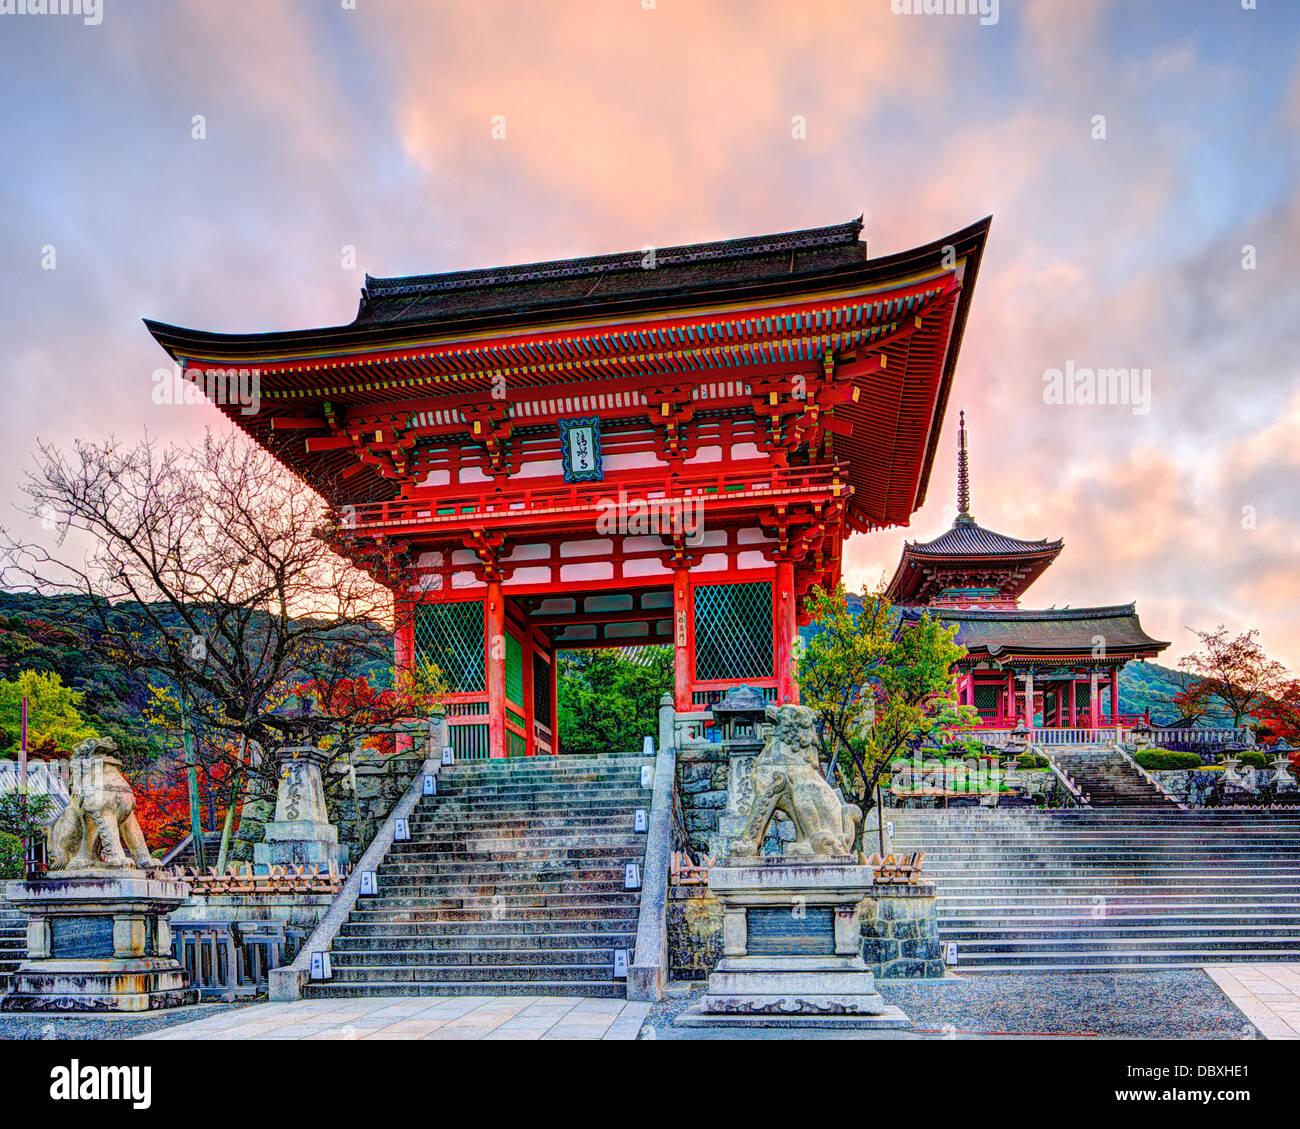 Kiyomizu-dera Temple Gate in Kyoto, Japan in the morning Stock Photo, Royalty...